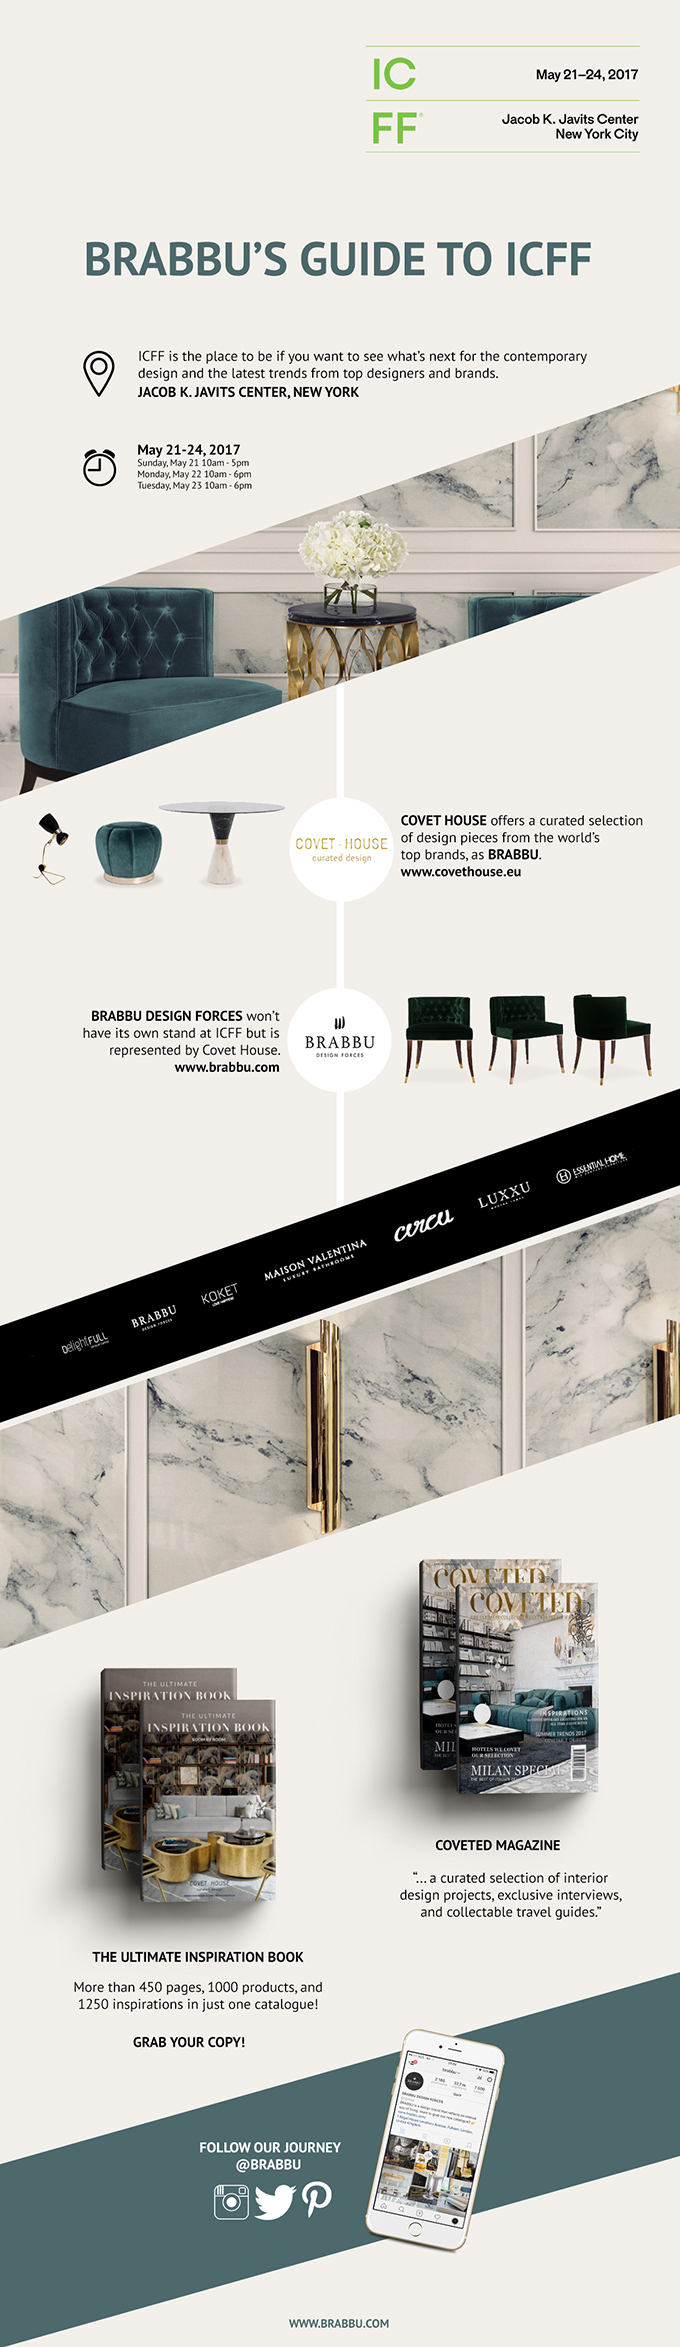 ICFF BRABBU'S Ultimate guide for ICFF & New York Design Week decon